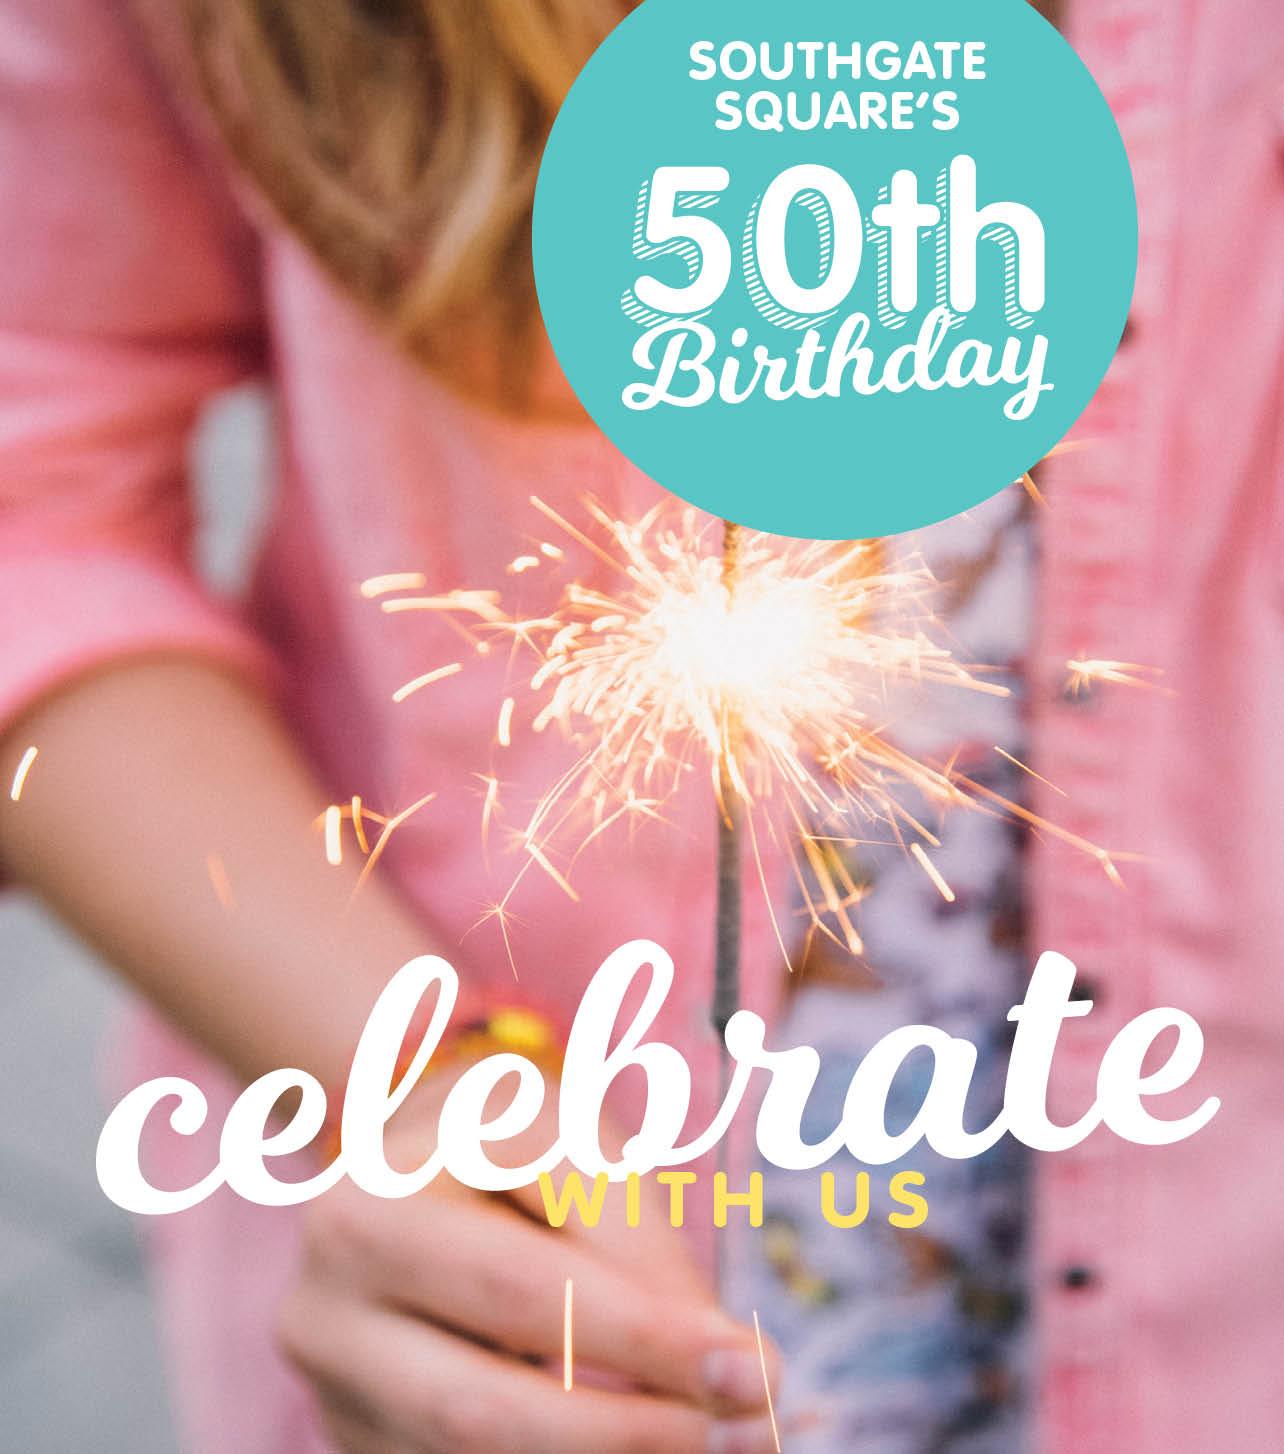 CH4336_Charter Hall_Southgate__Web Tiles_Celebrate_642x727@2